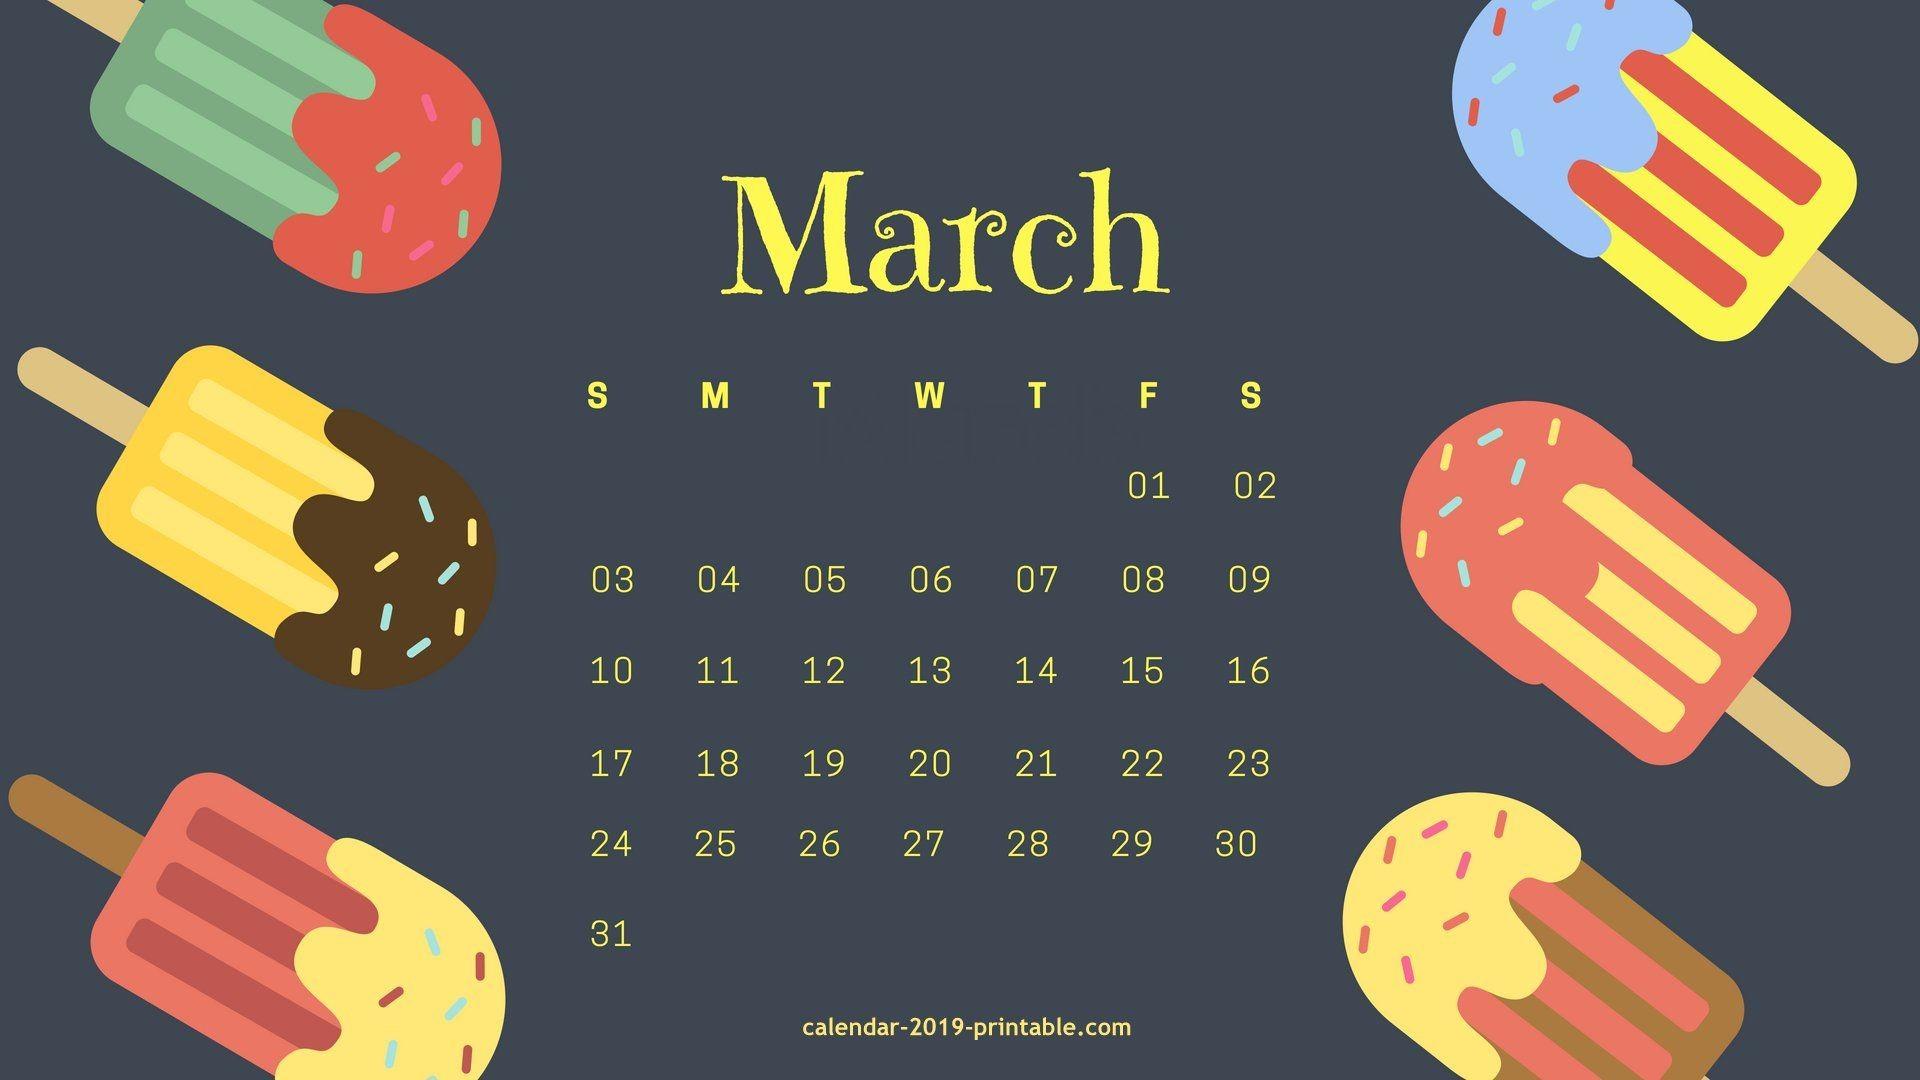 march 2019 desktop background calendar